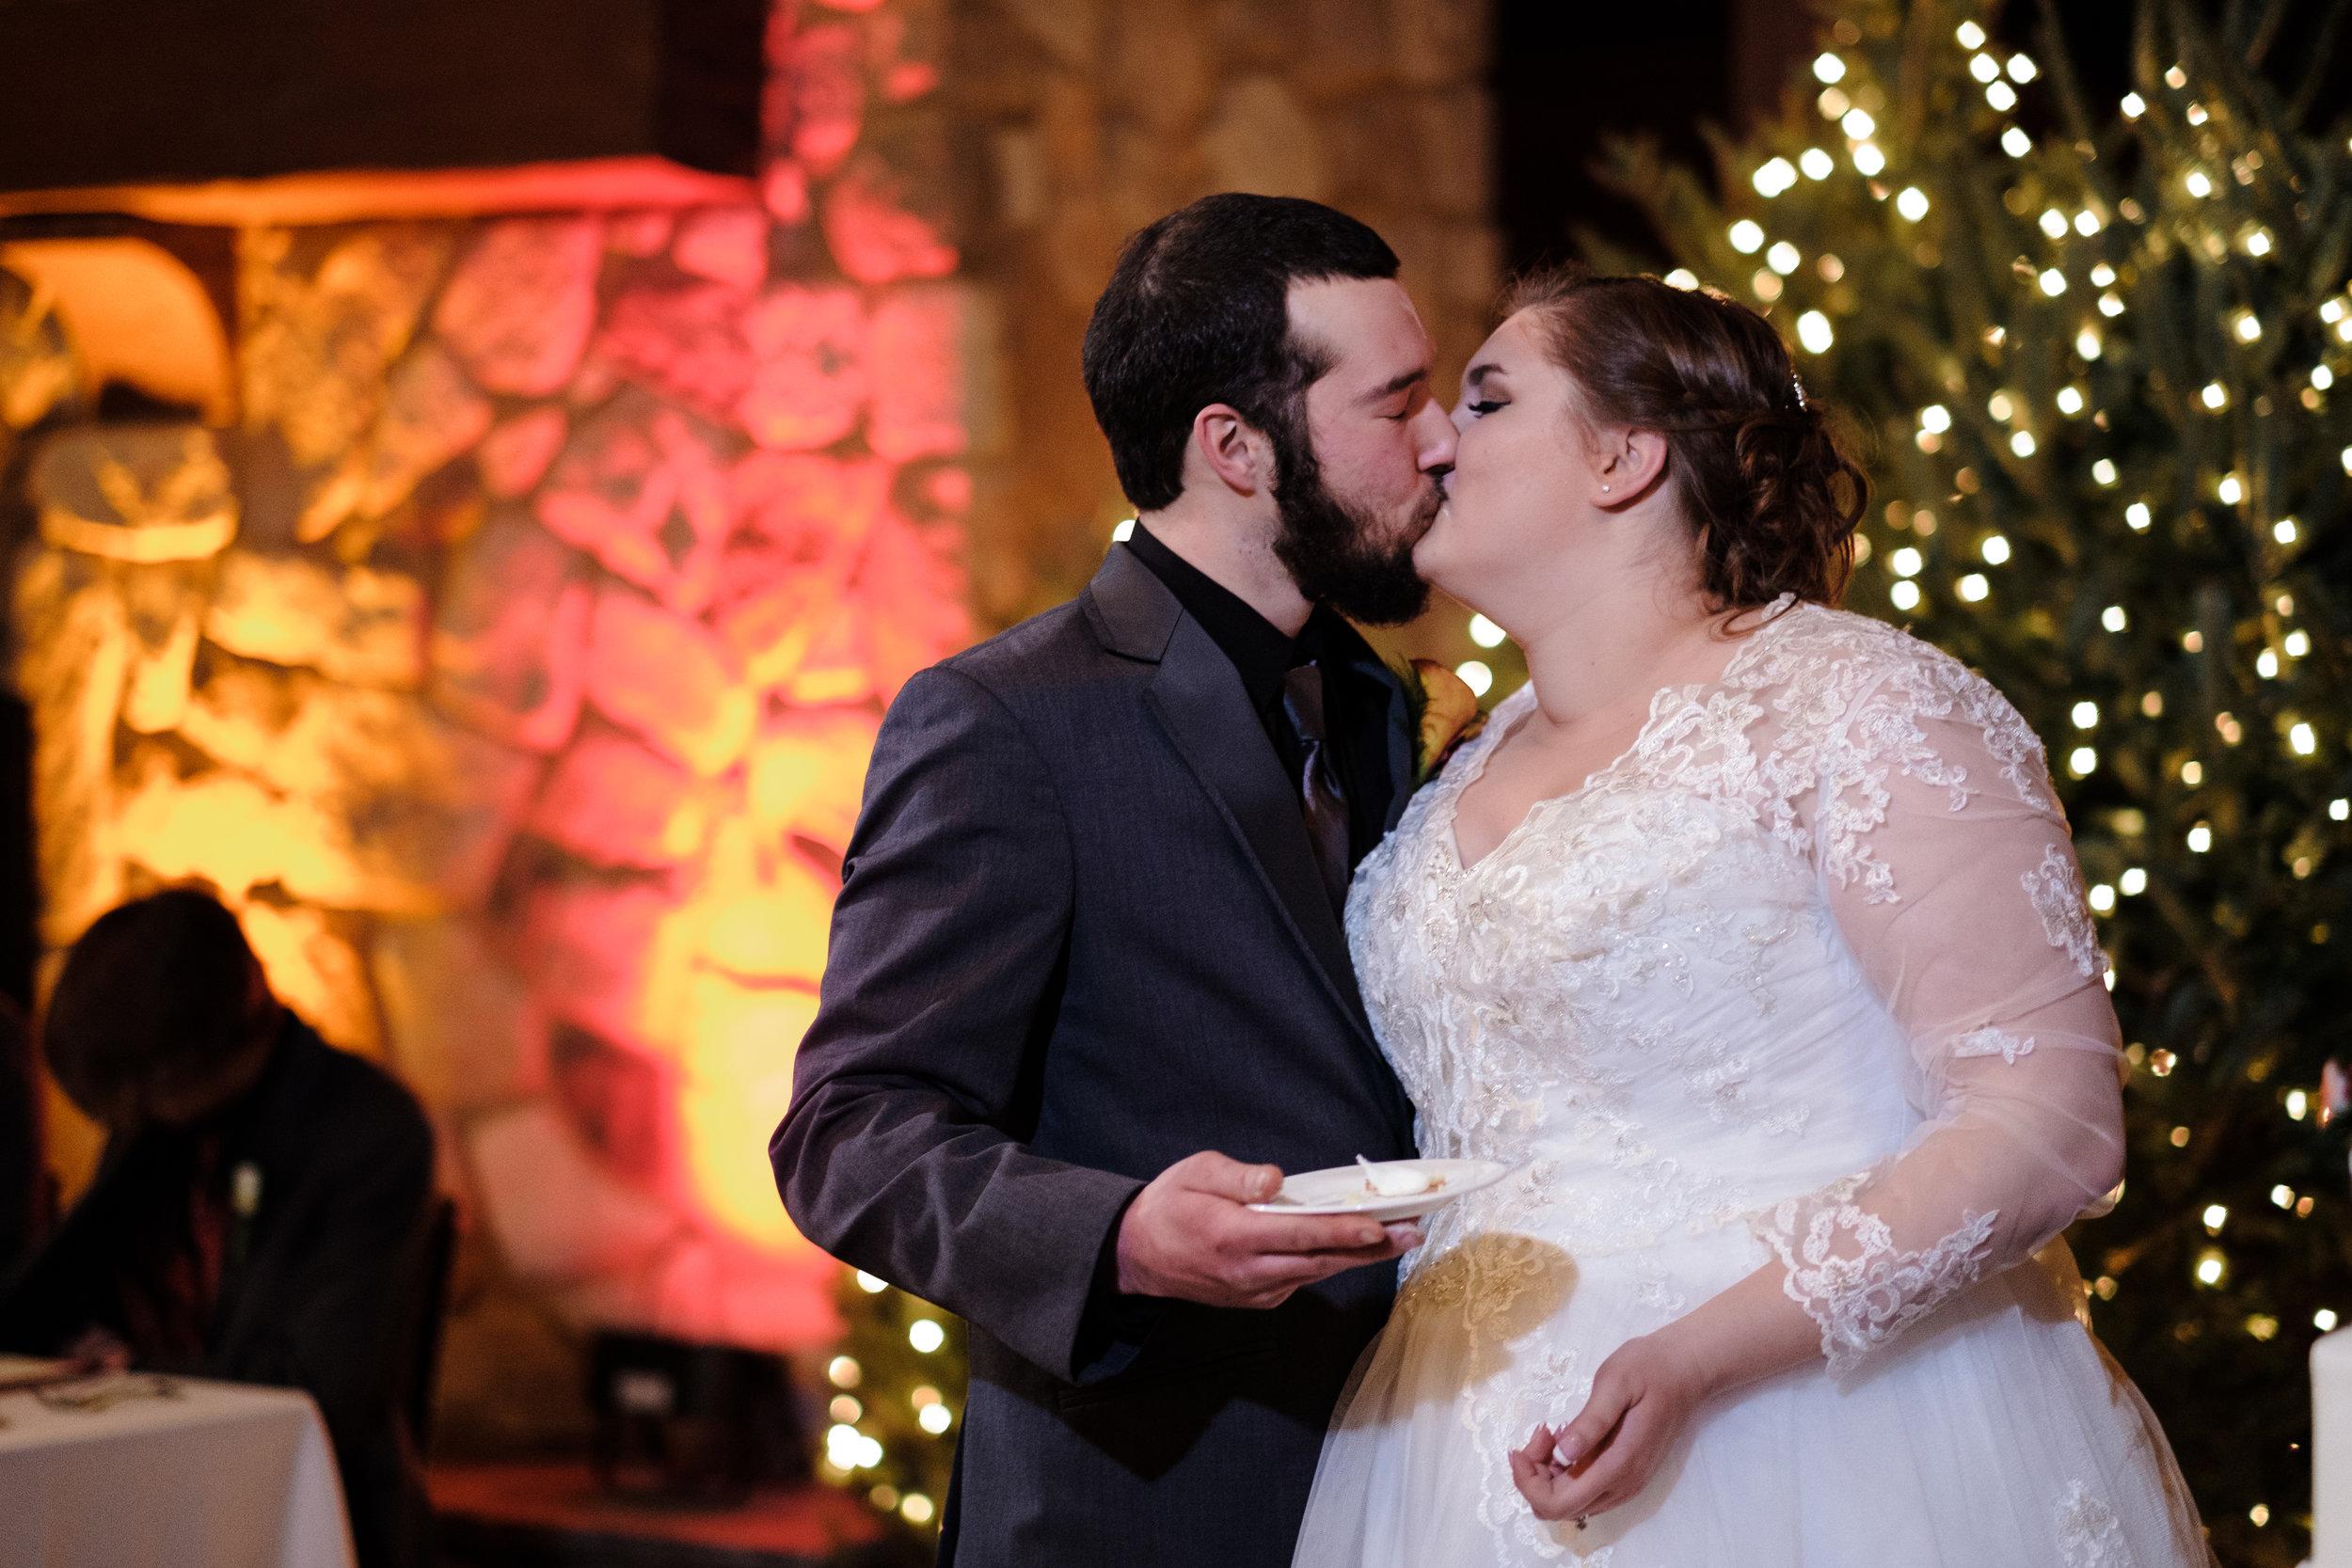 18-12-28 Corinne-Henry-Pavilion-Wedding-460.jpg